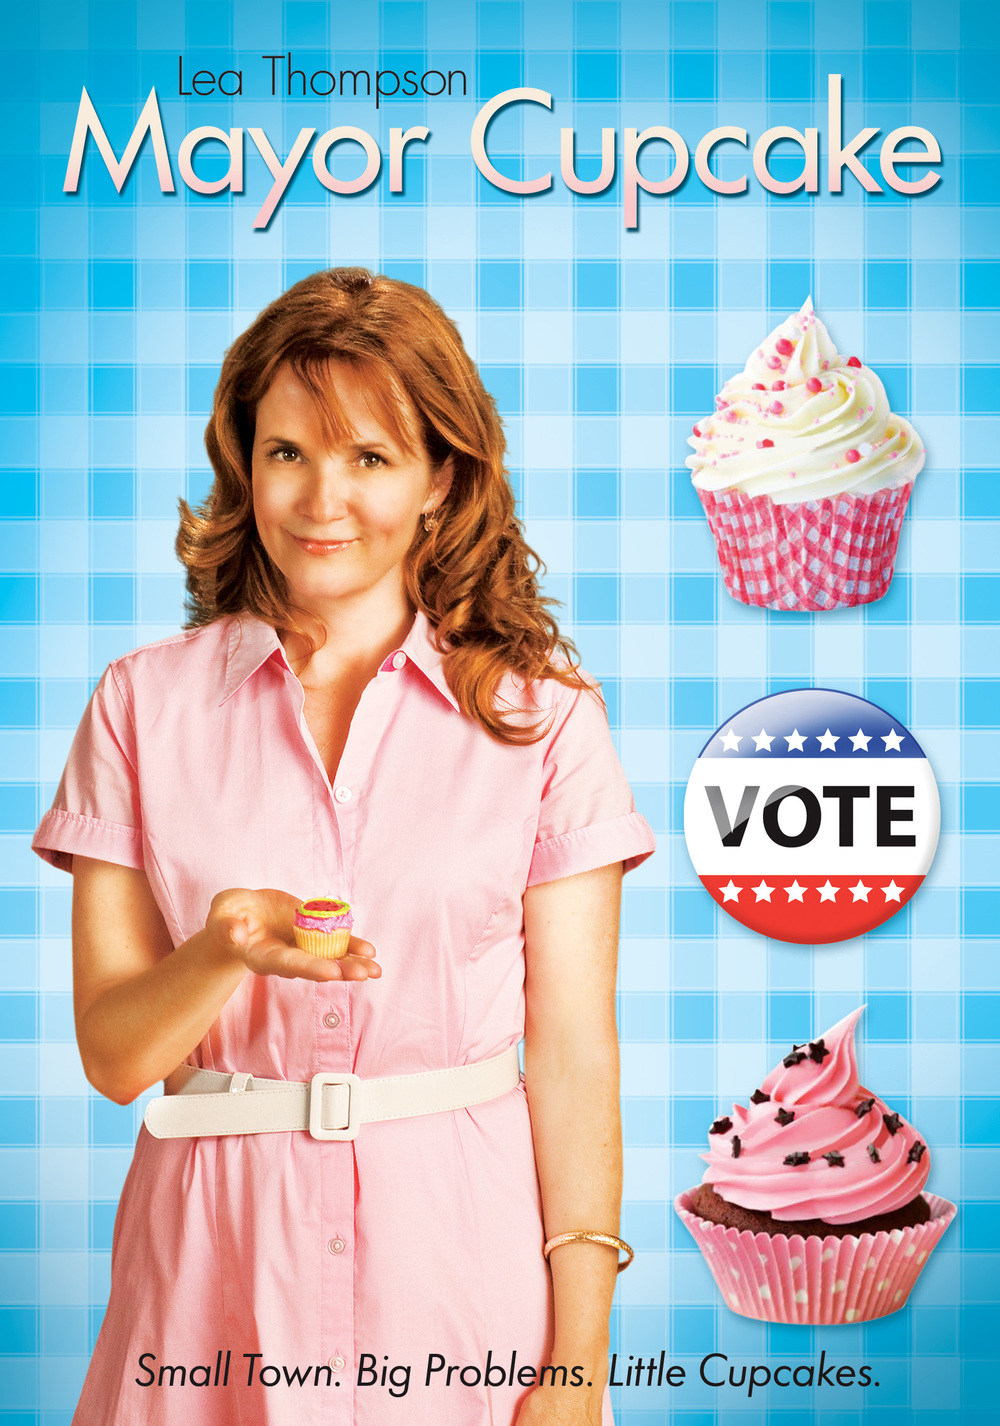 Mayor Cupcake Keyart